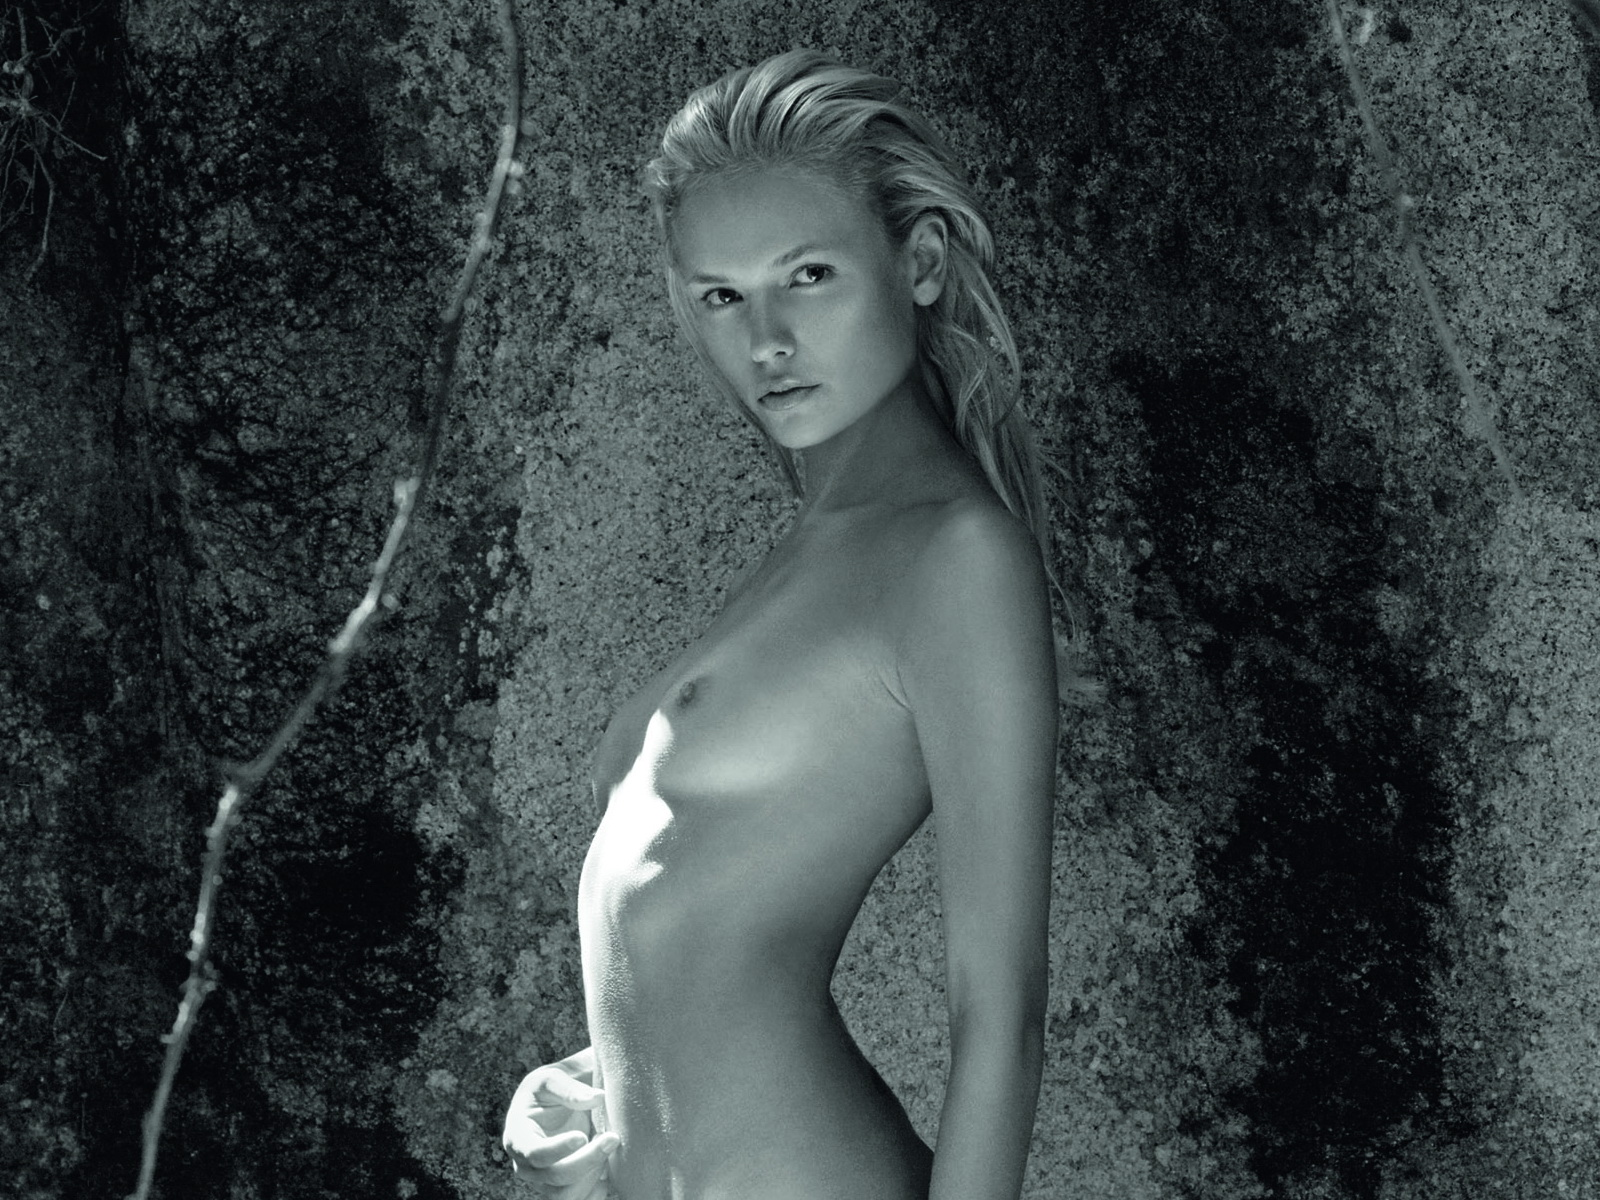 http://1.bp.blogspot.com/-Dbfbw0spP6k/Tt8_Gz5yYBI/AAAAAAAADH8/3PP9P_Db8_0/s1600/Natasha+Poly+nude+in+2012+Pirelli+Calendar.jpg